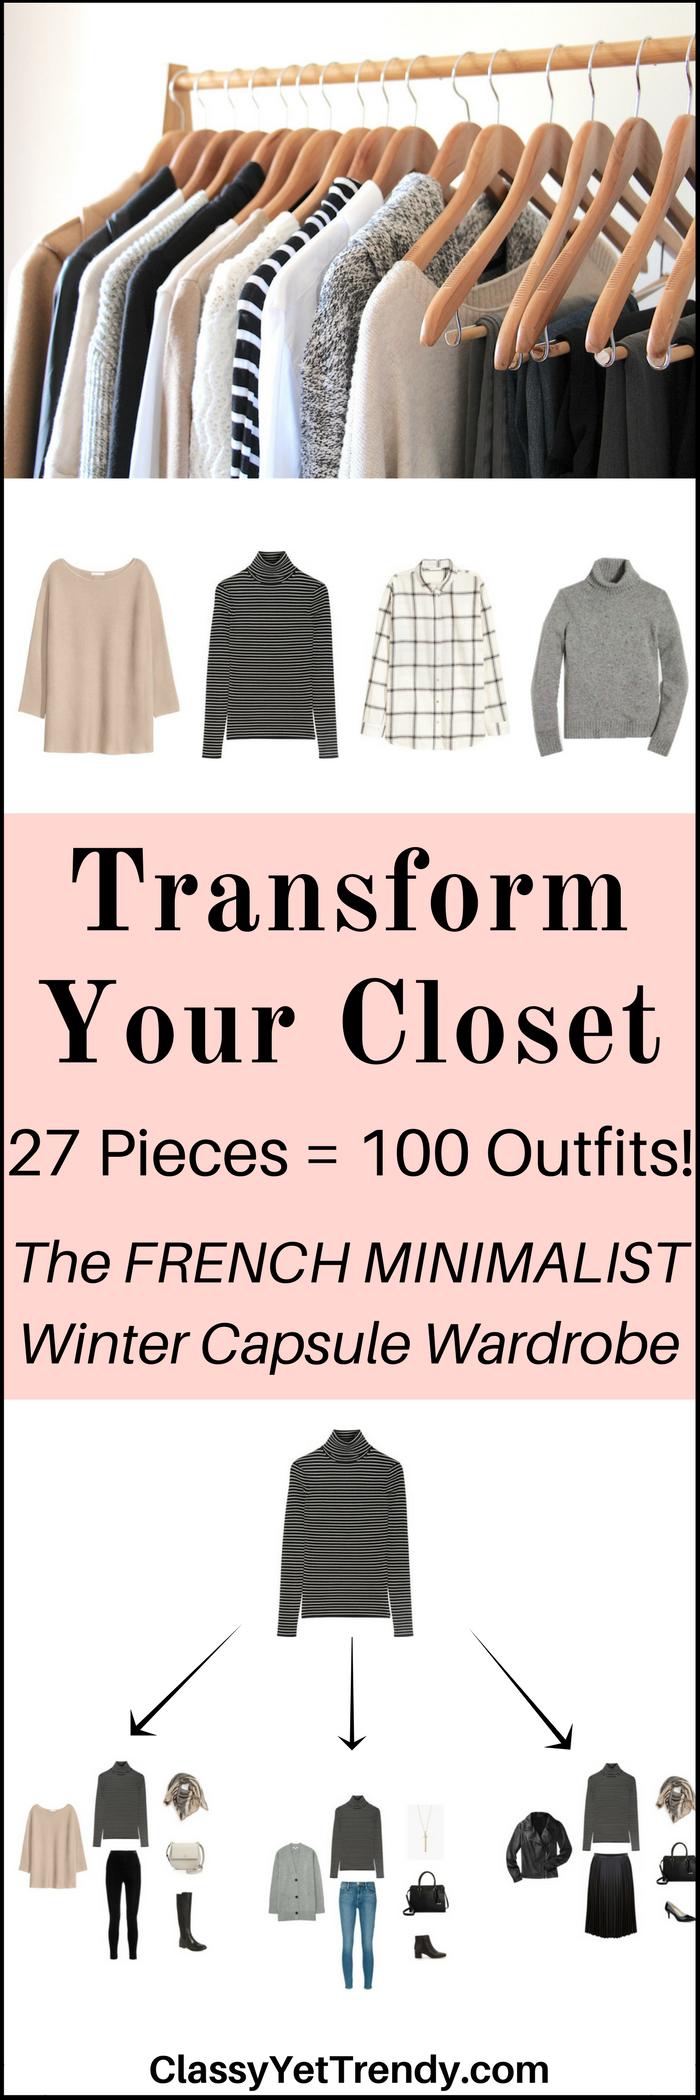 The French Minimalist Capsule Wardrobe: Winter 2017